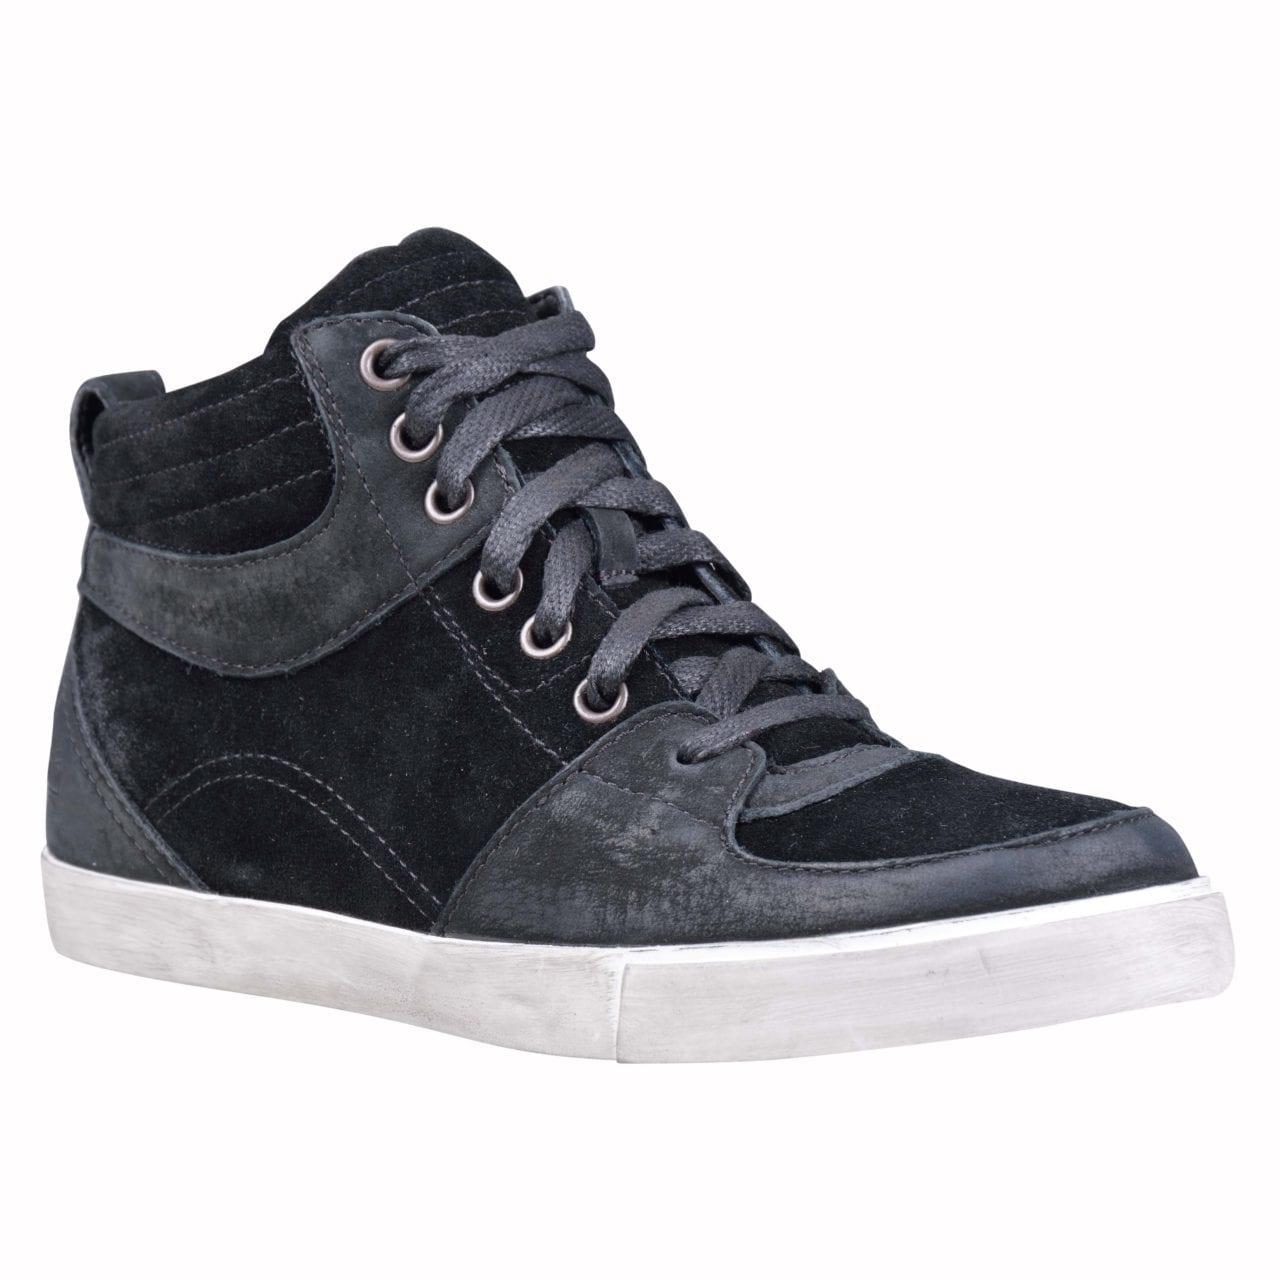 Glastenbury Sneaker Leather Chukka Black_$219.00